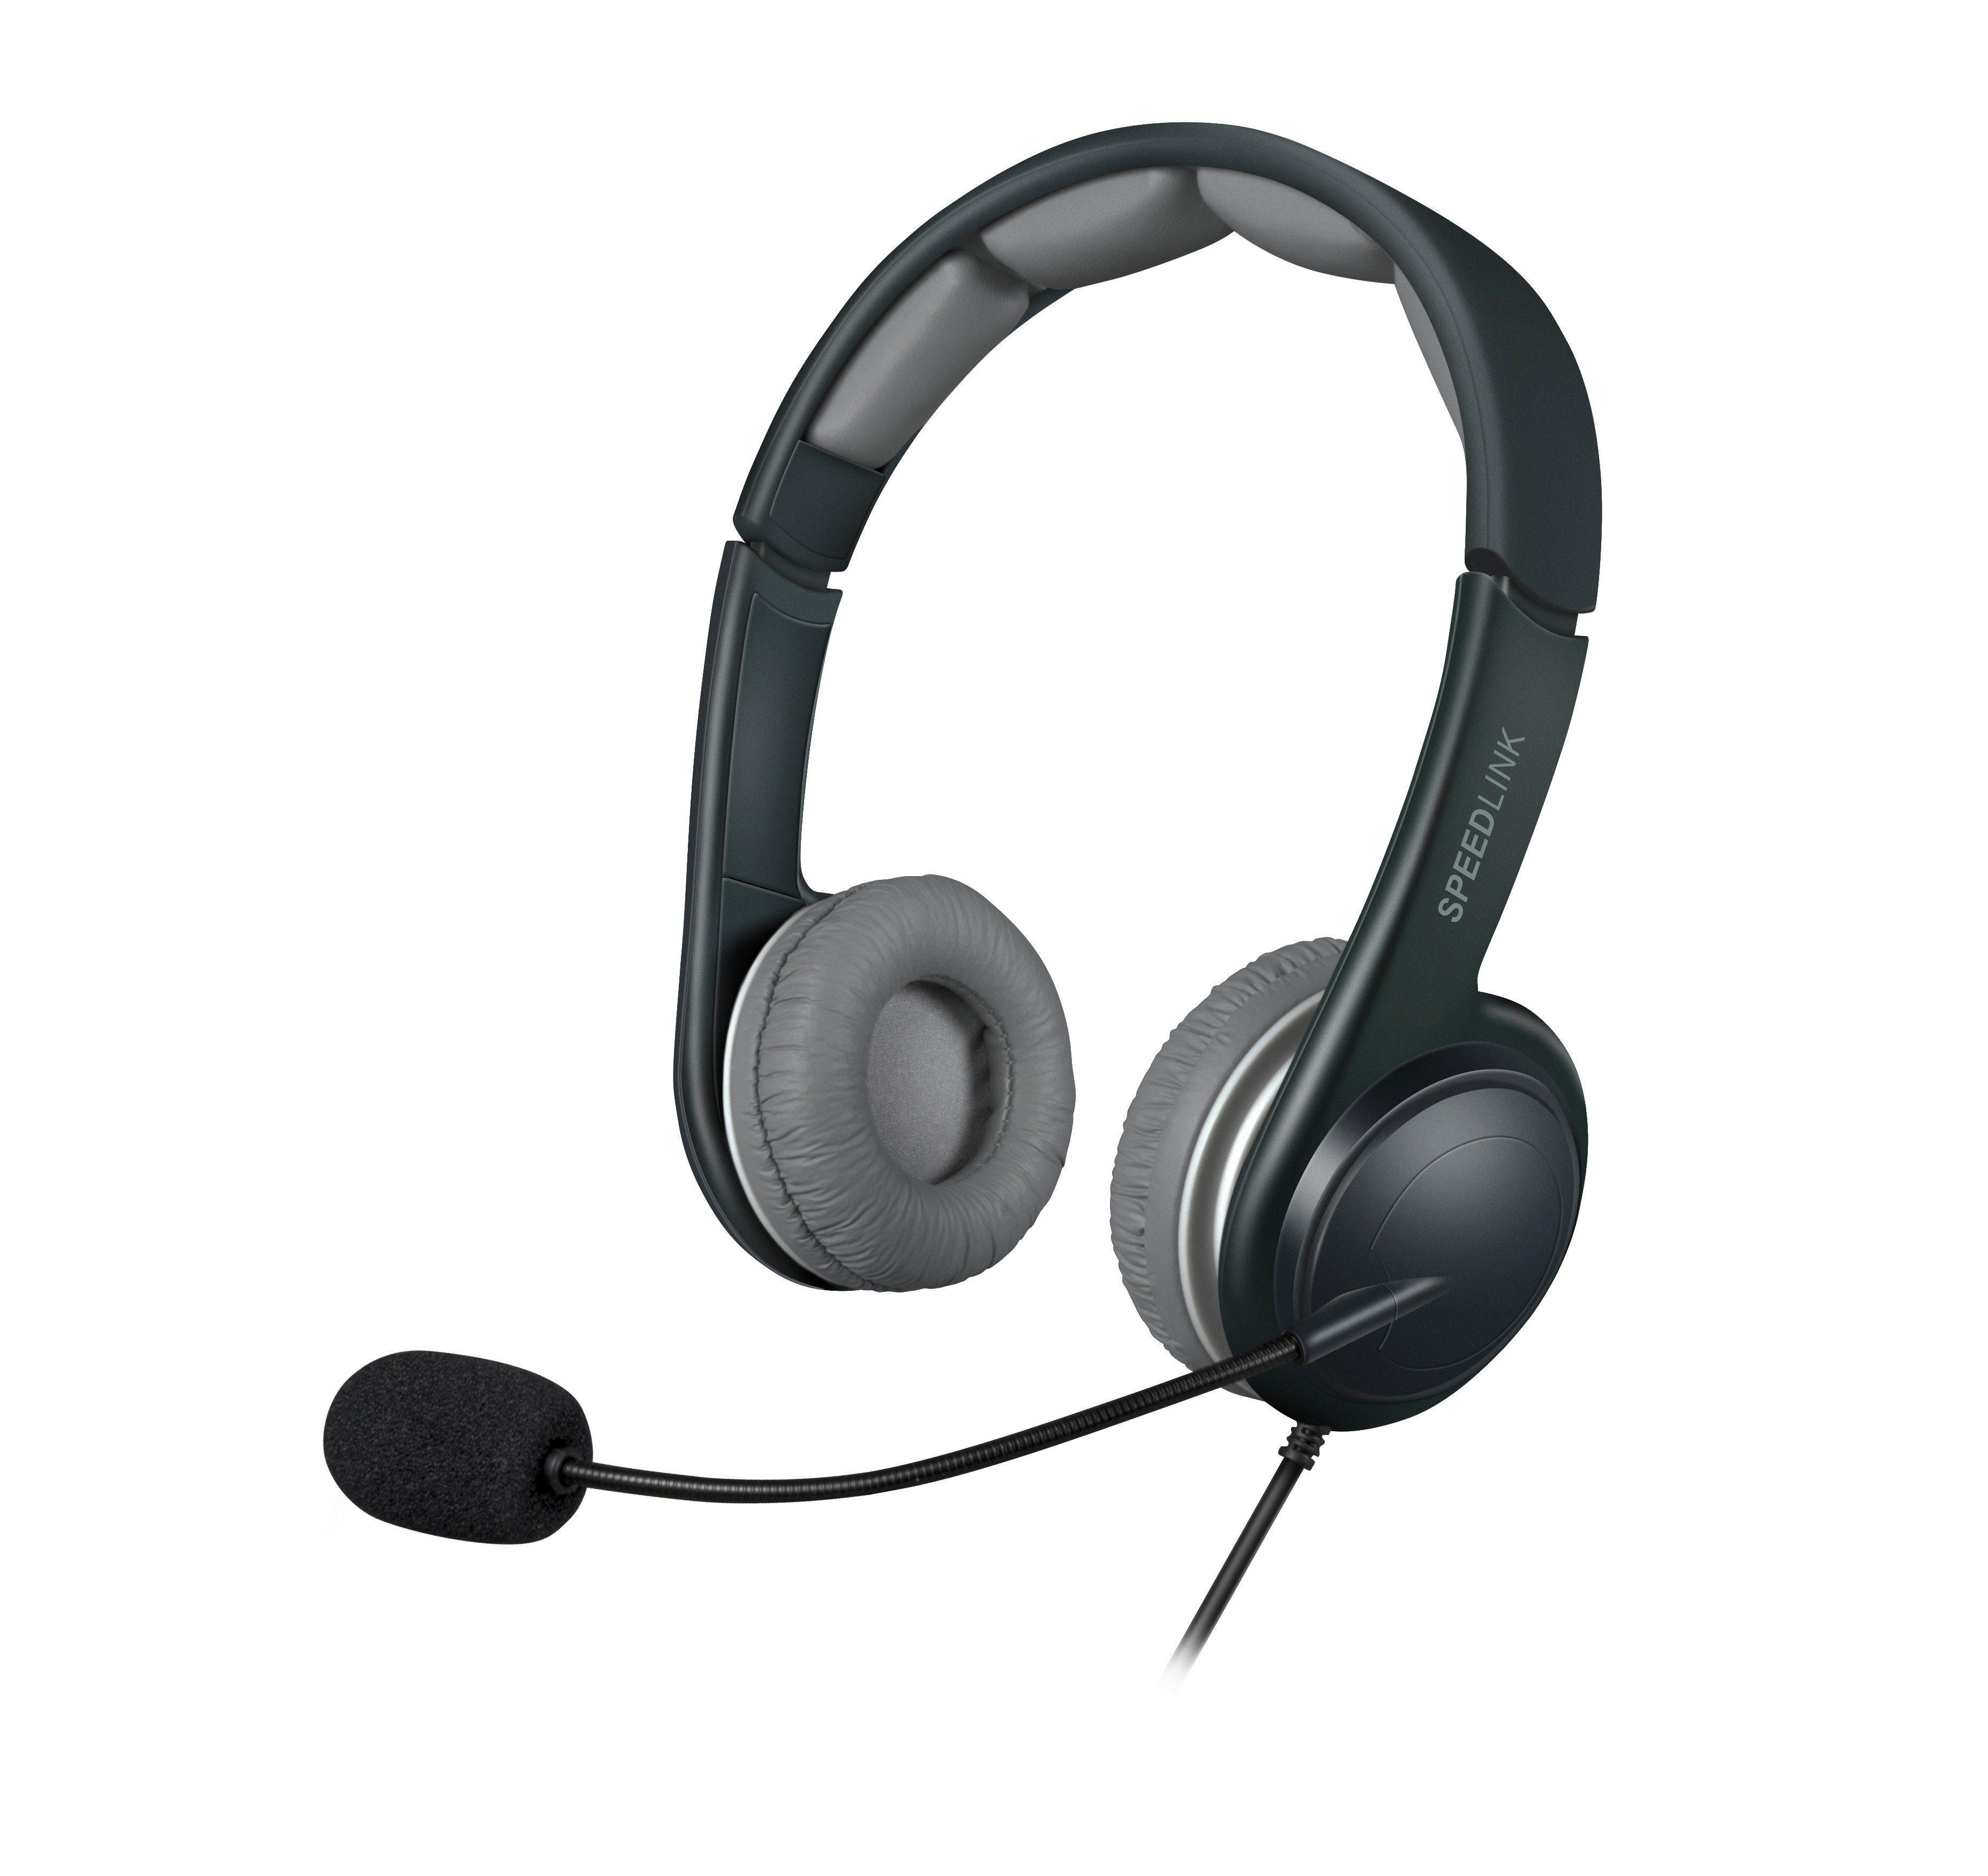 SPEEDLINK Stereo Headset »SONID Stereo Headset - USB schwarz-grau«